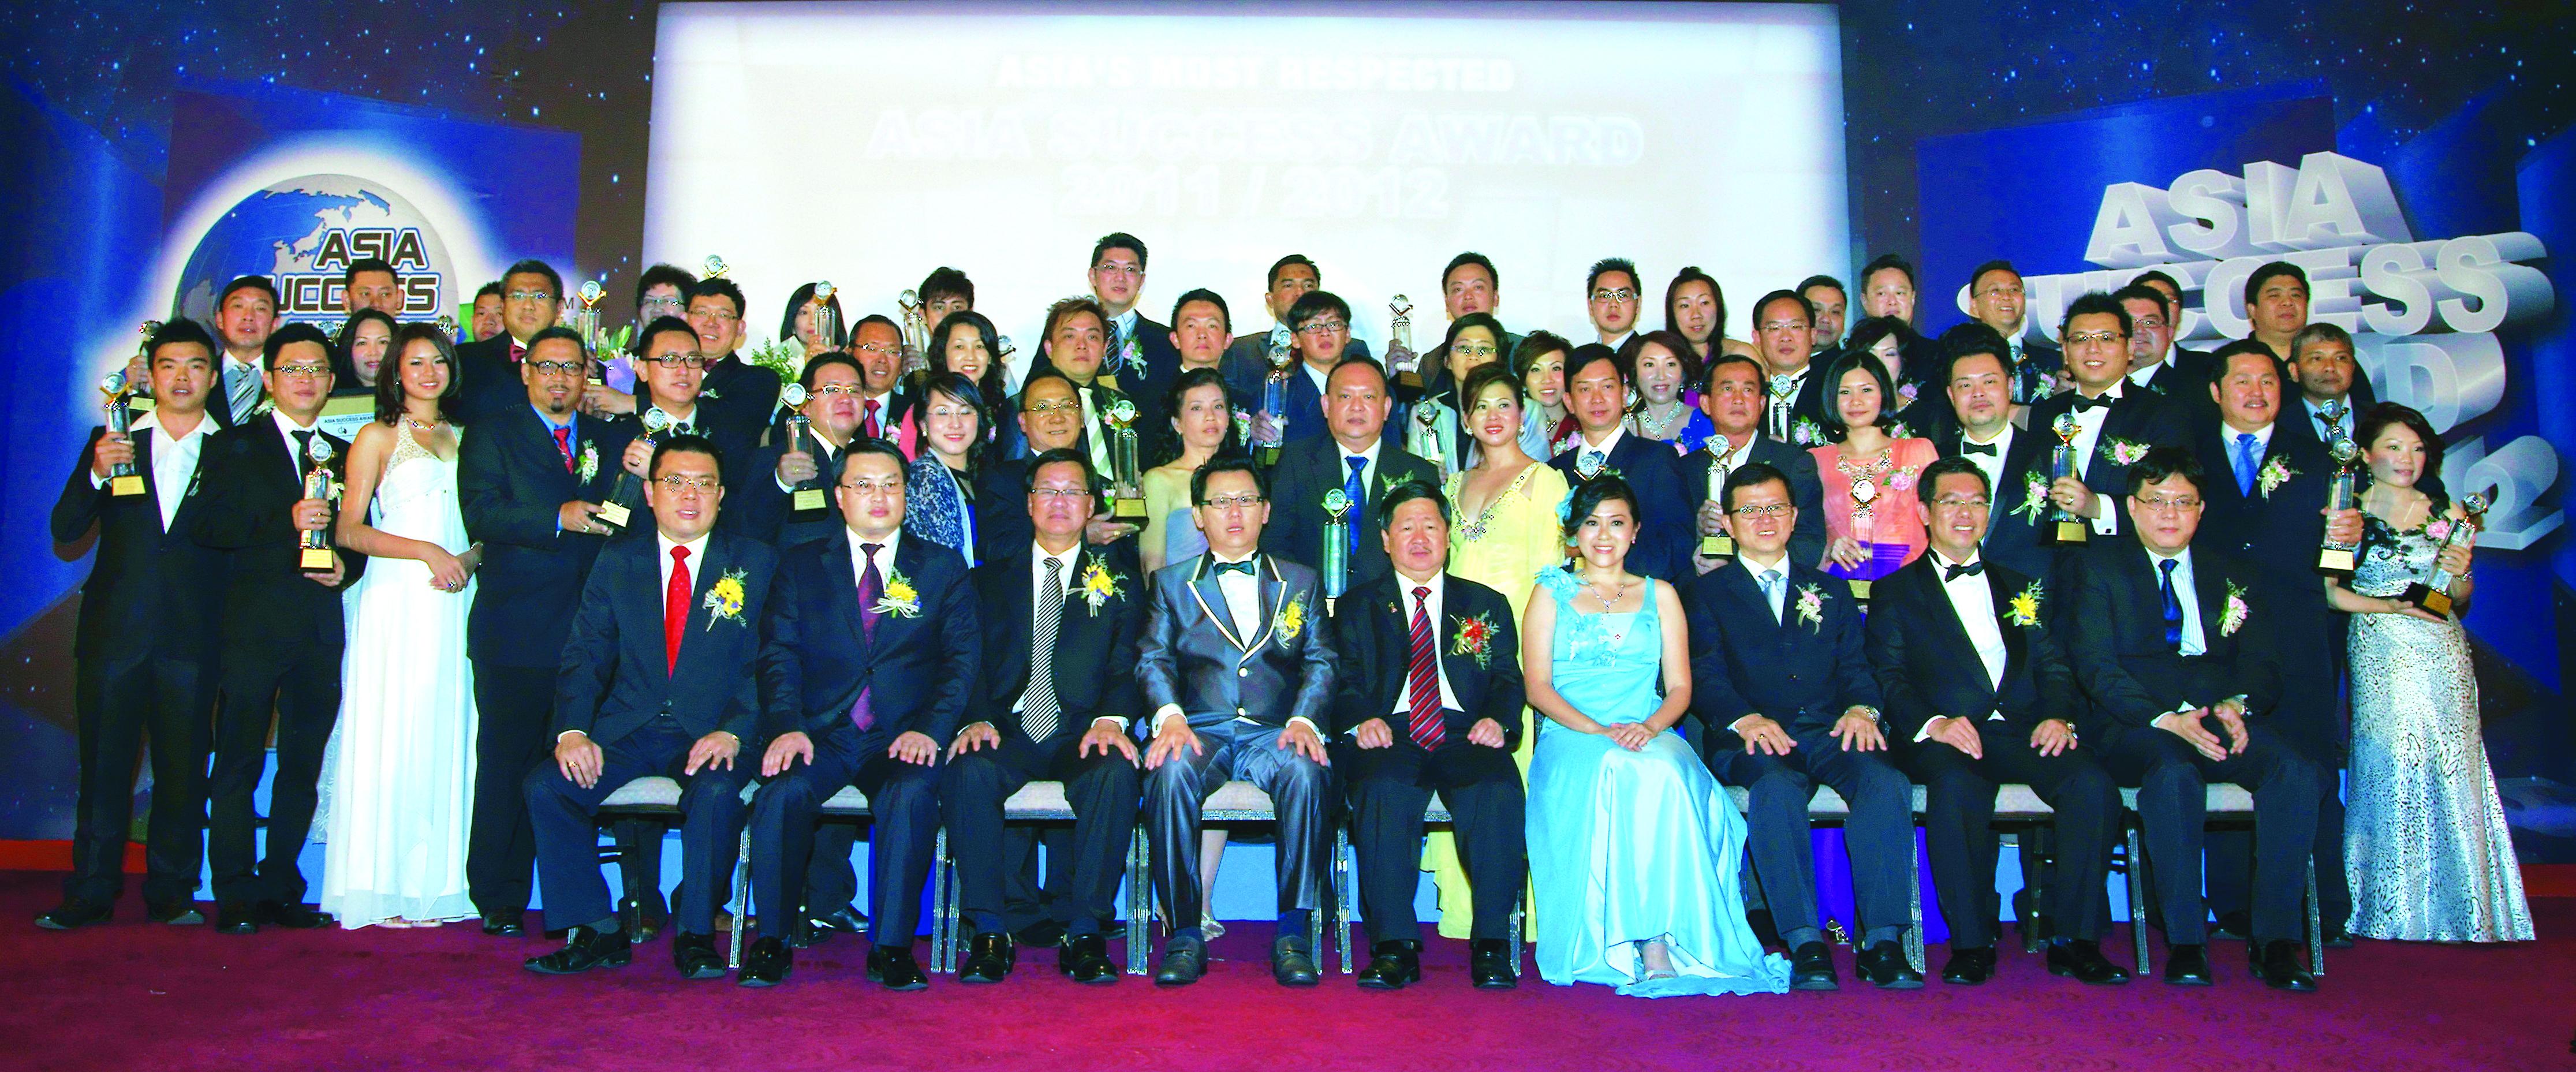 The 2nd Asia Success Award